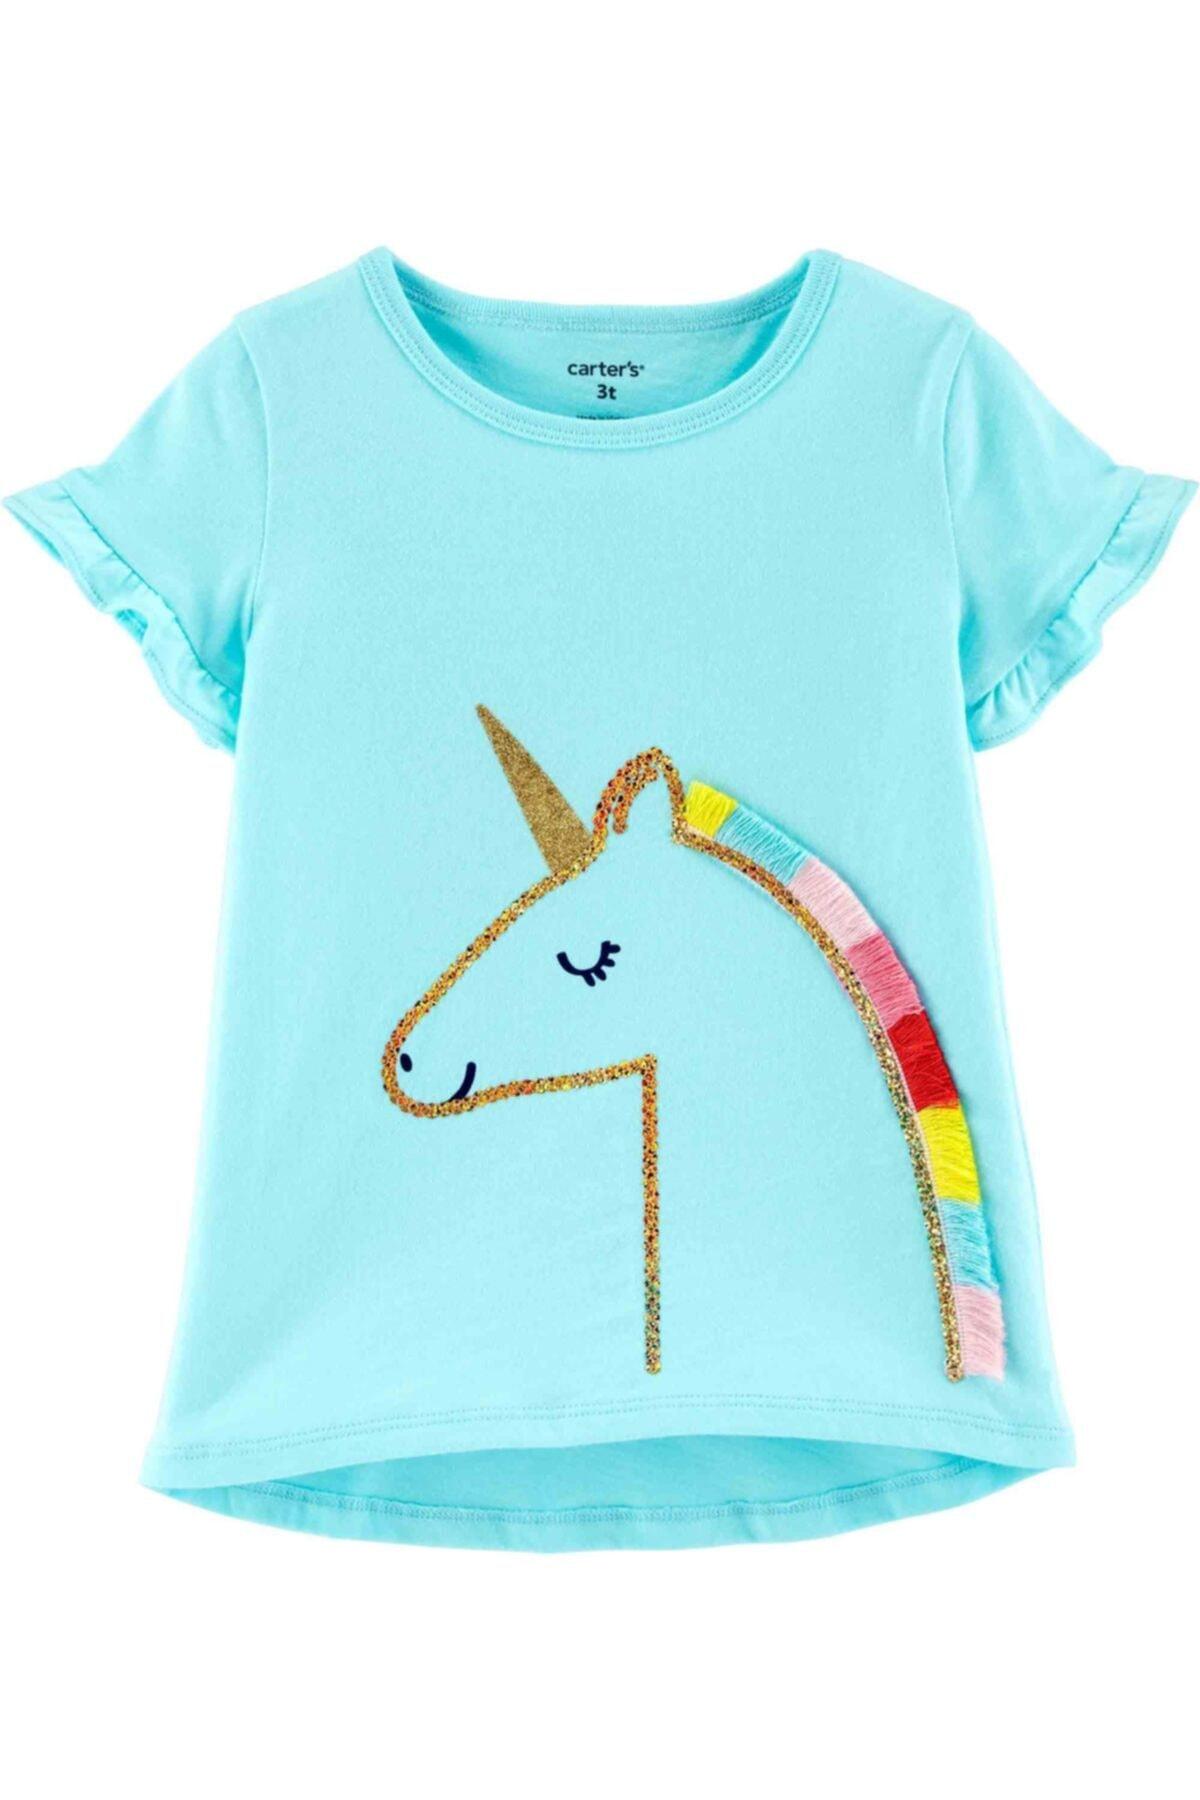 Carter's Küçük Kız Çocuk Tshirt 1